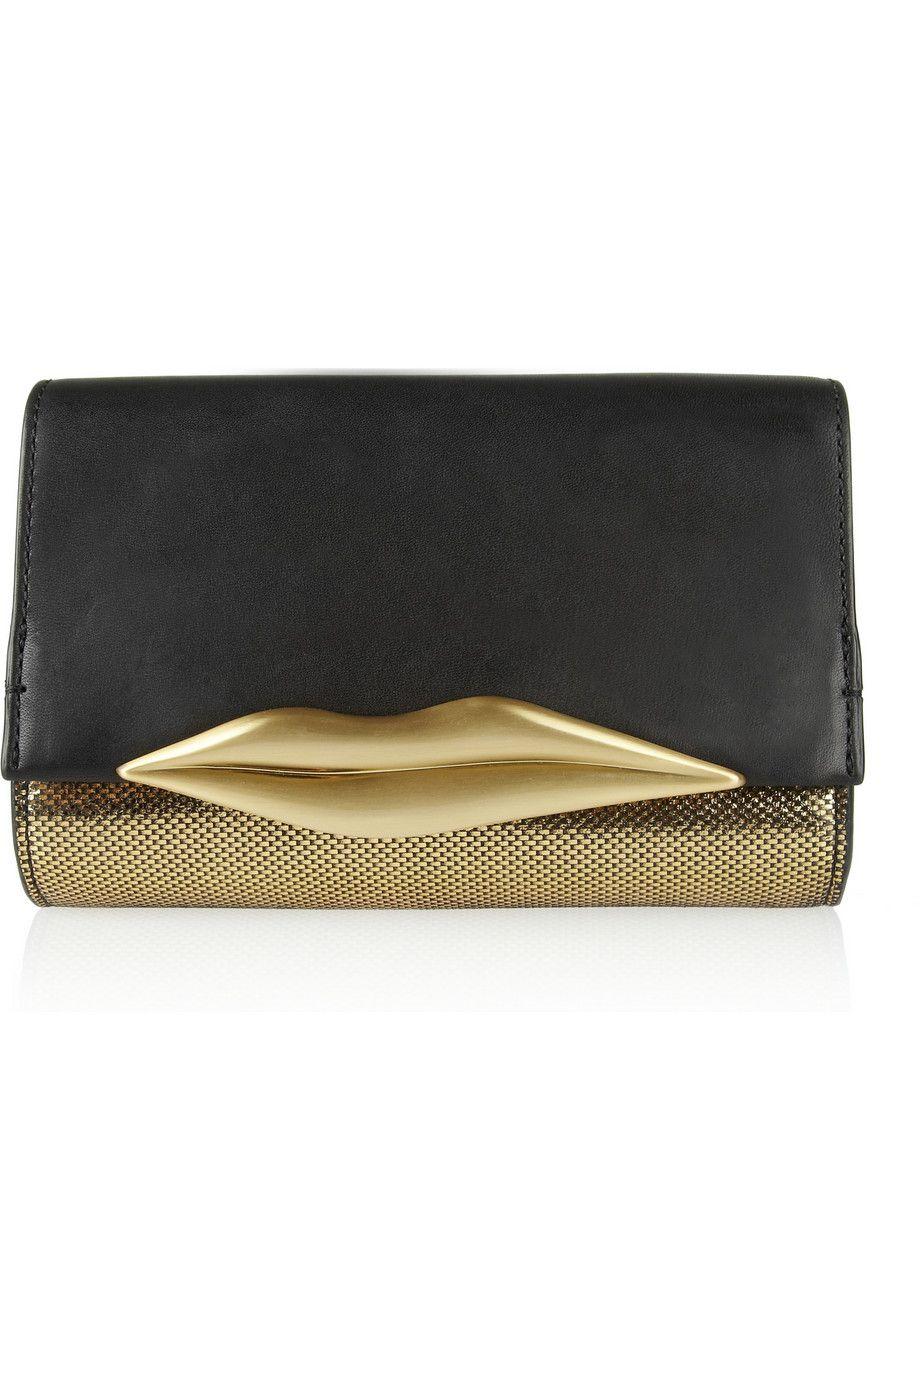 1b65076eda4 Diane von Furstenberg Lips embellished leather clutch #NET-A-PORTER ...